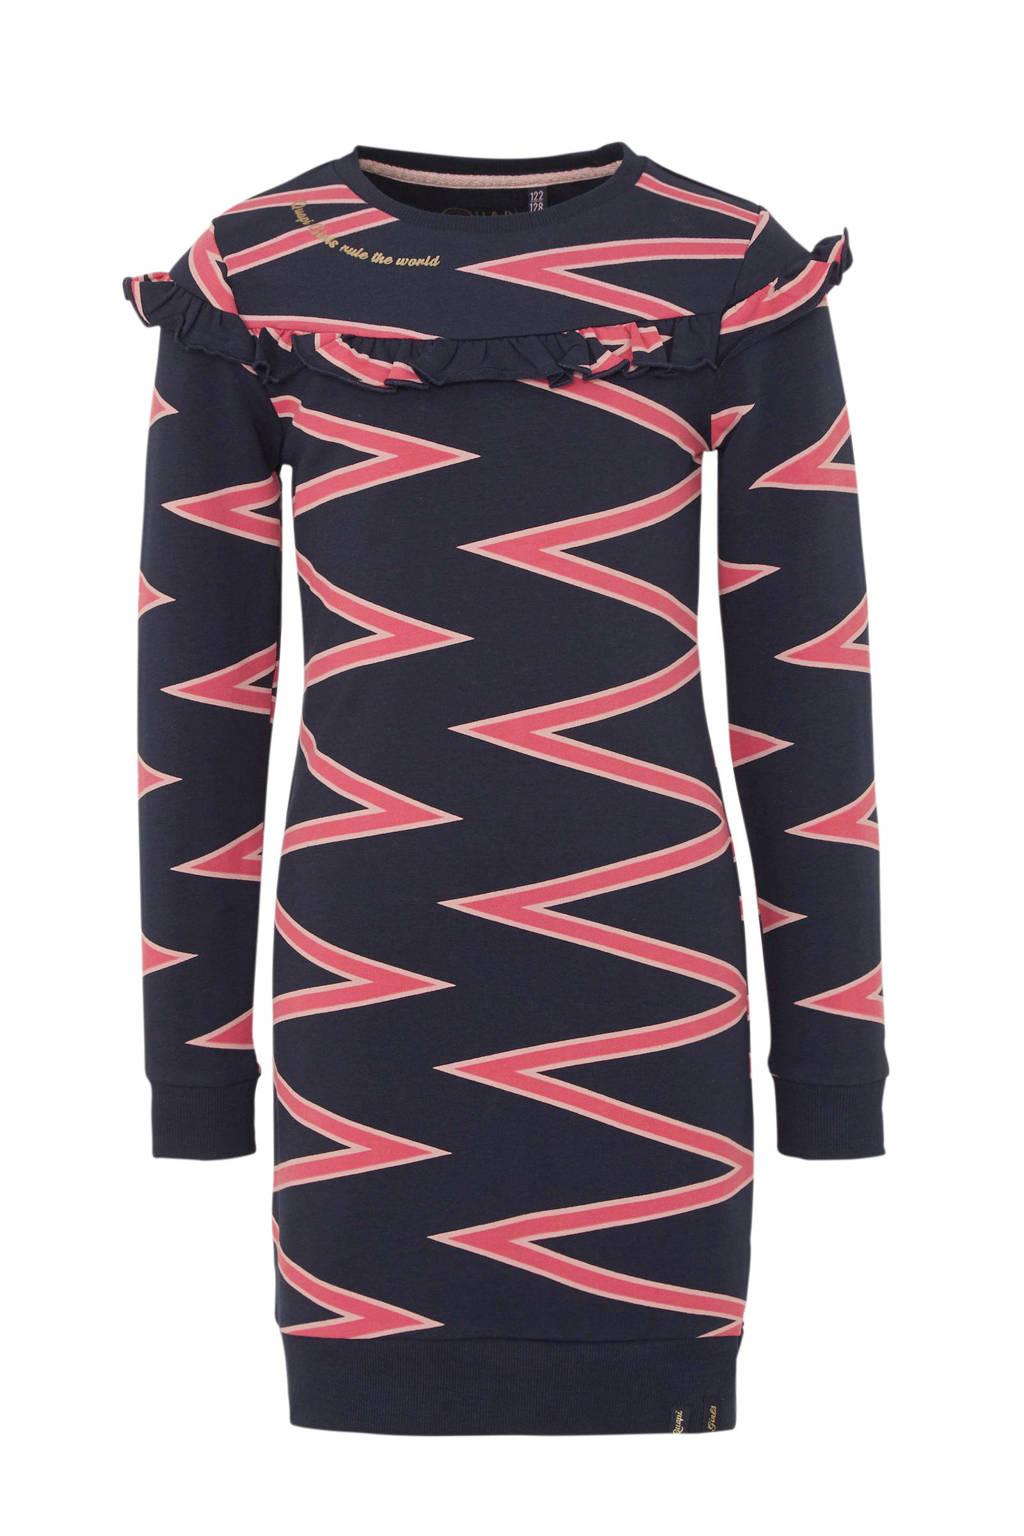 Quapi sweatjurk Wende met zigzag dessin donkerblauw/roze, Donkerblauw/roze